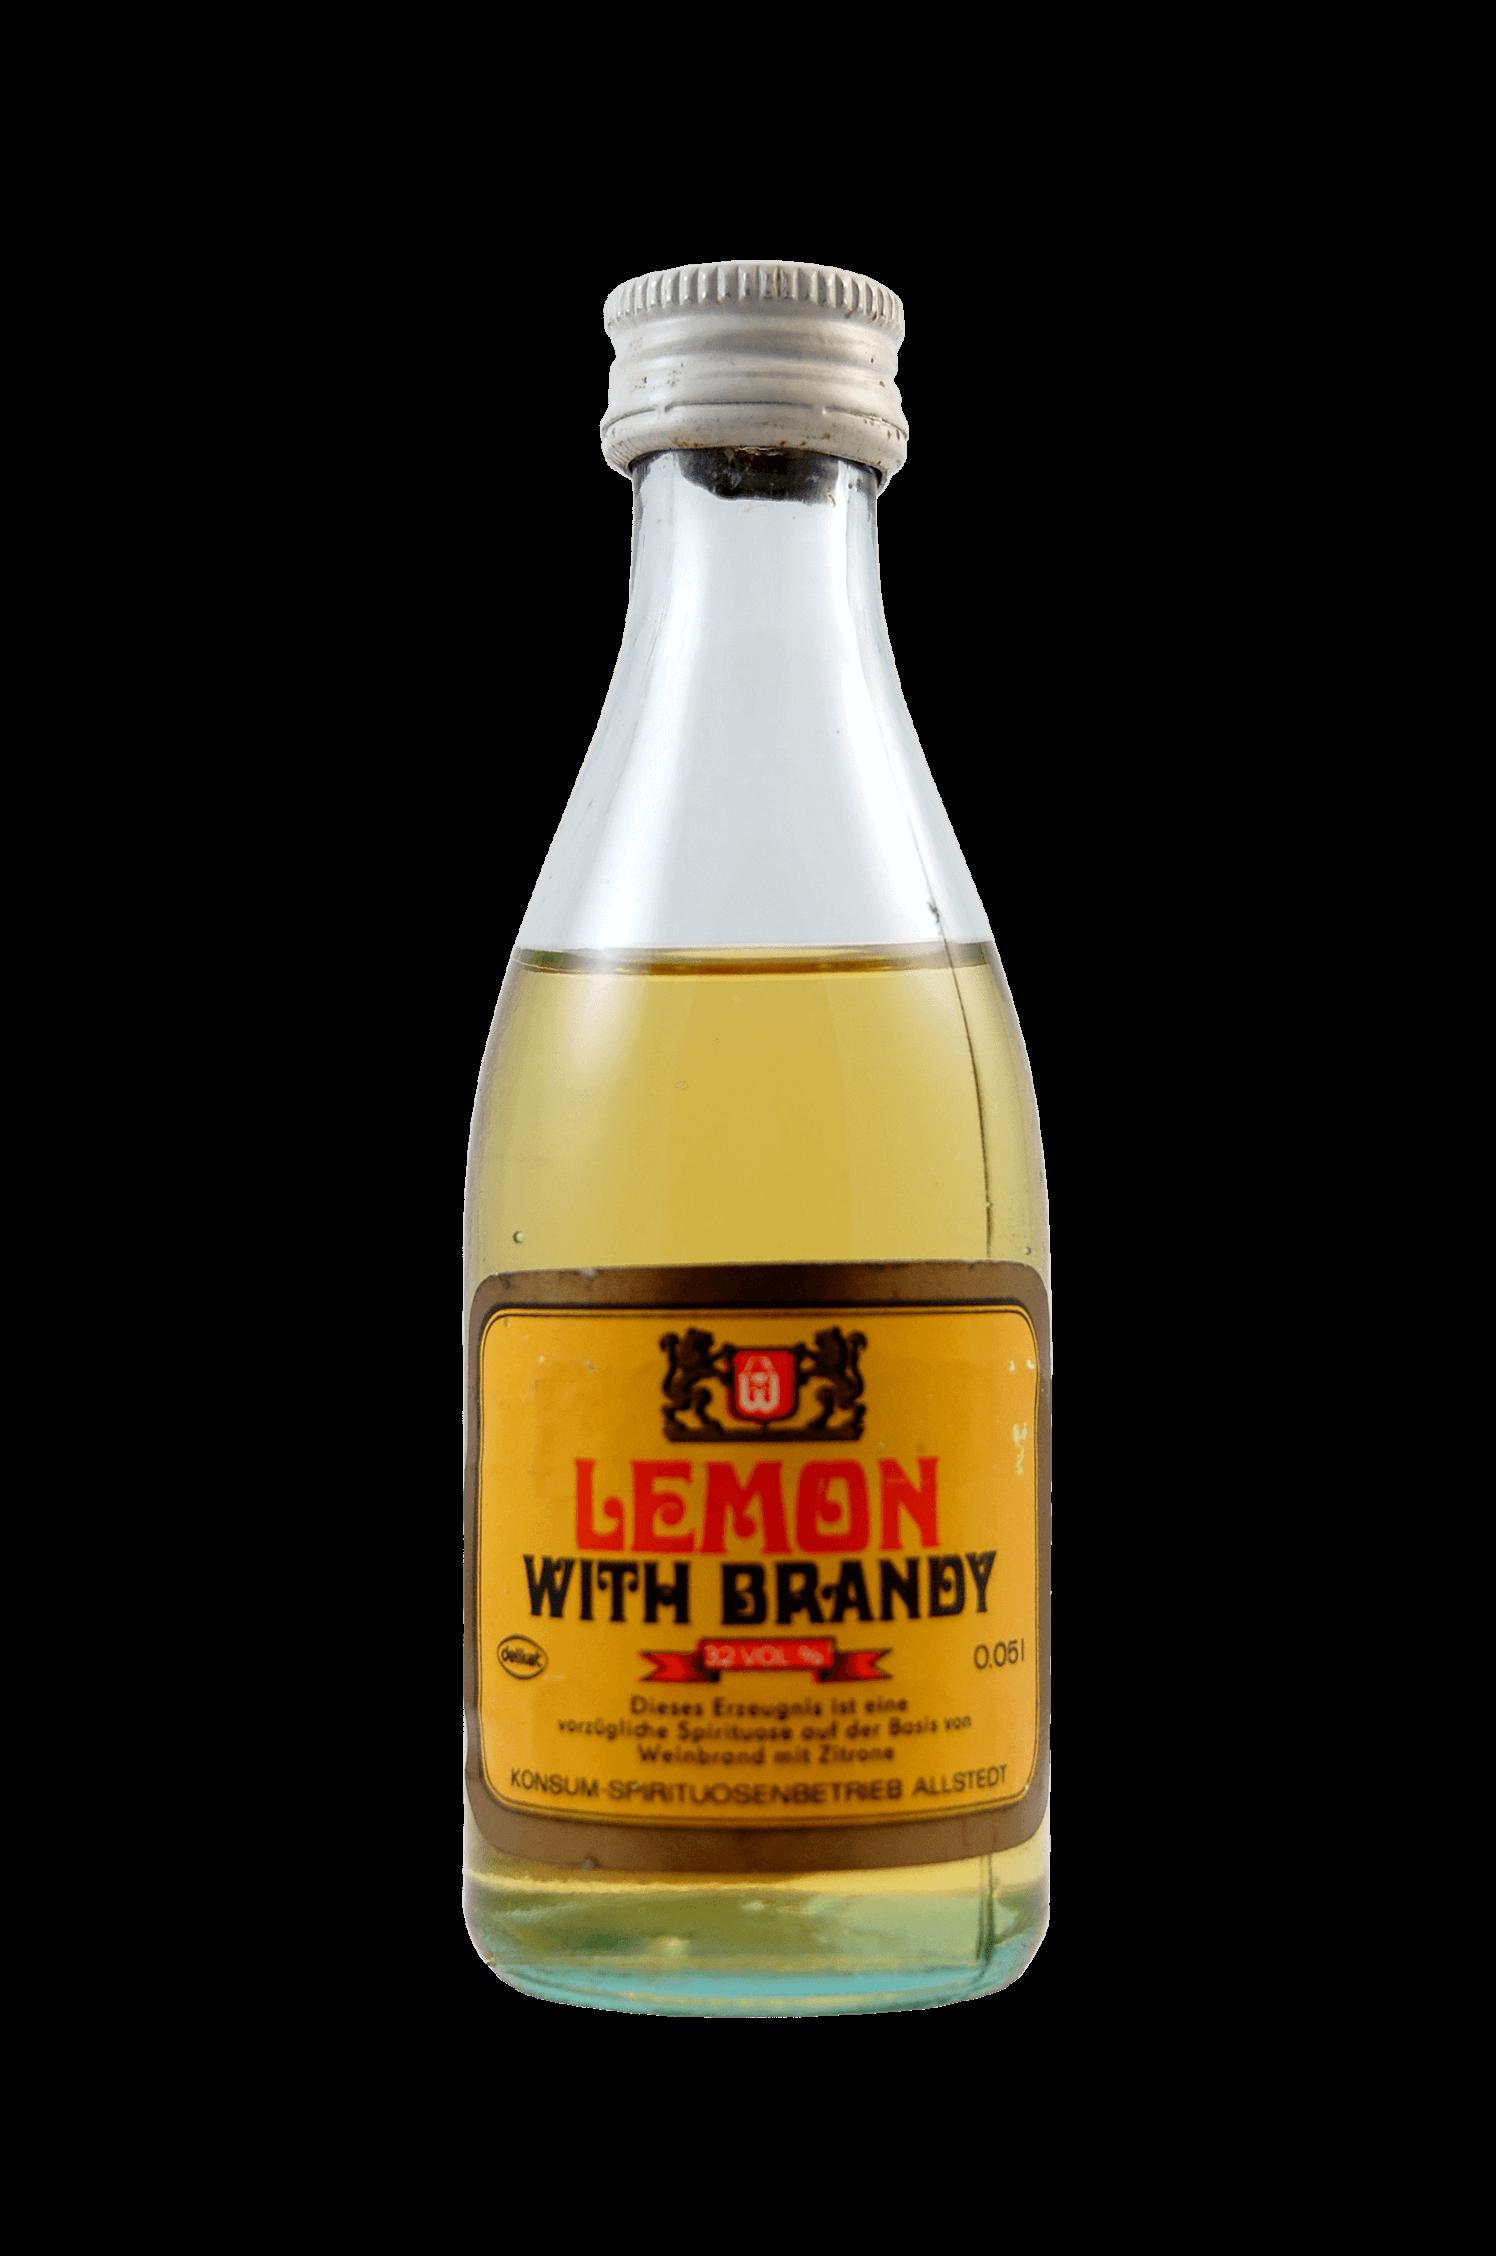 Lemon With Brandy